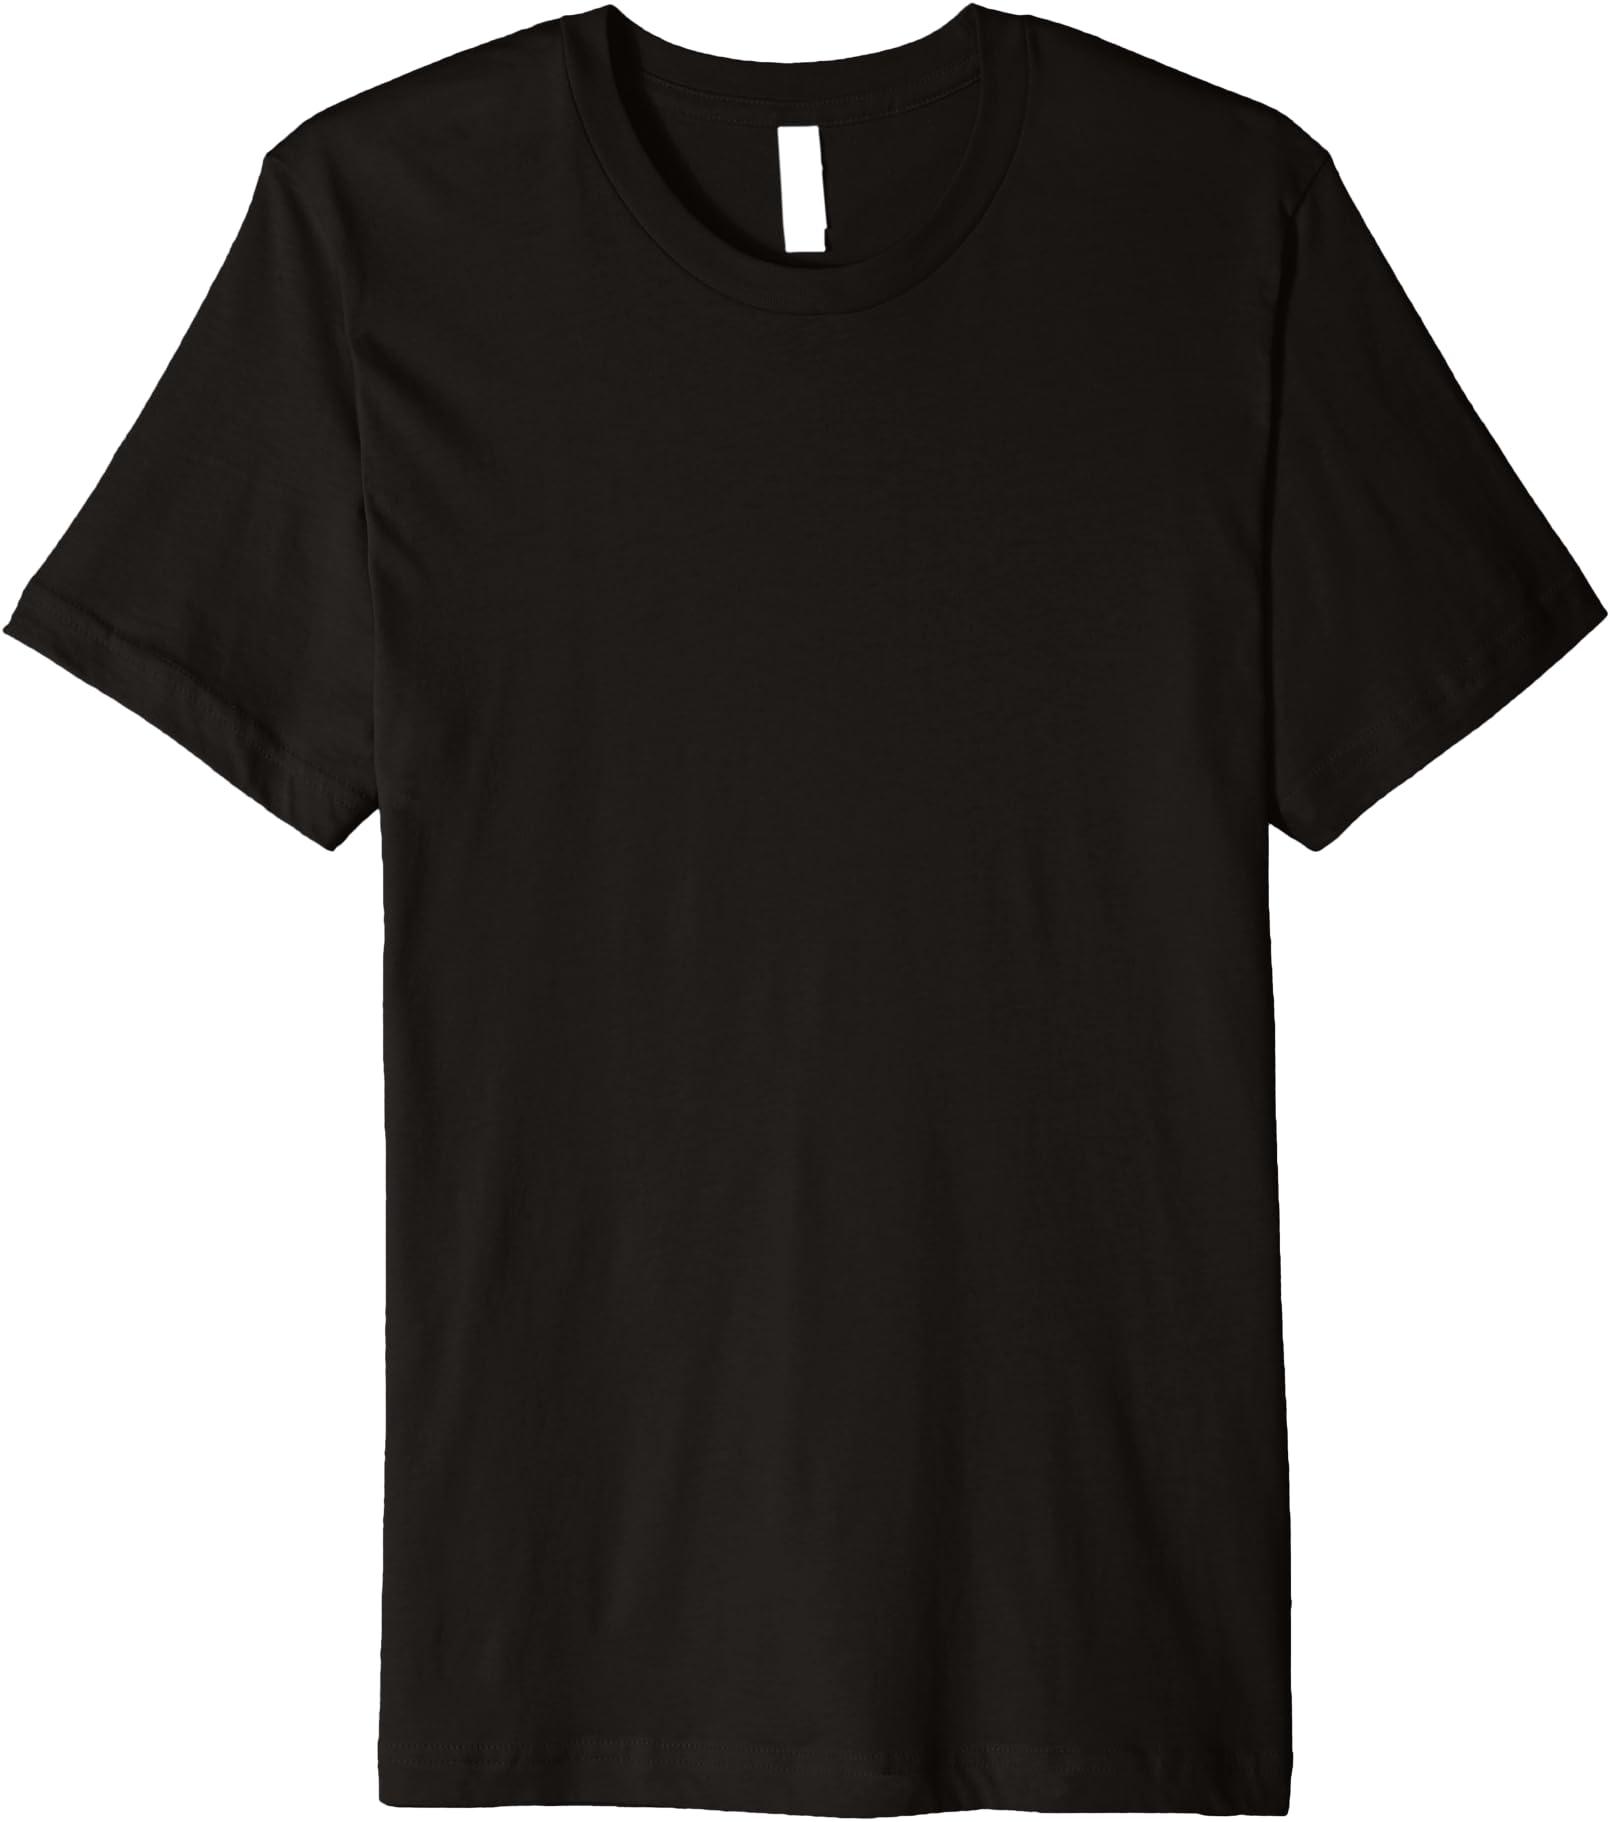 BLACK SABBATH CROSS CLASSIC Official T Shirt Size S Grey Mens Licensed Merch